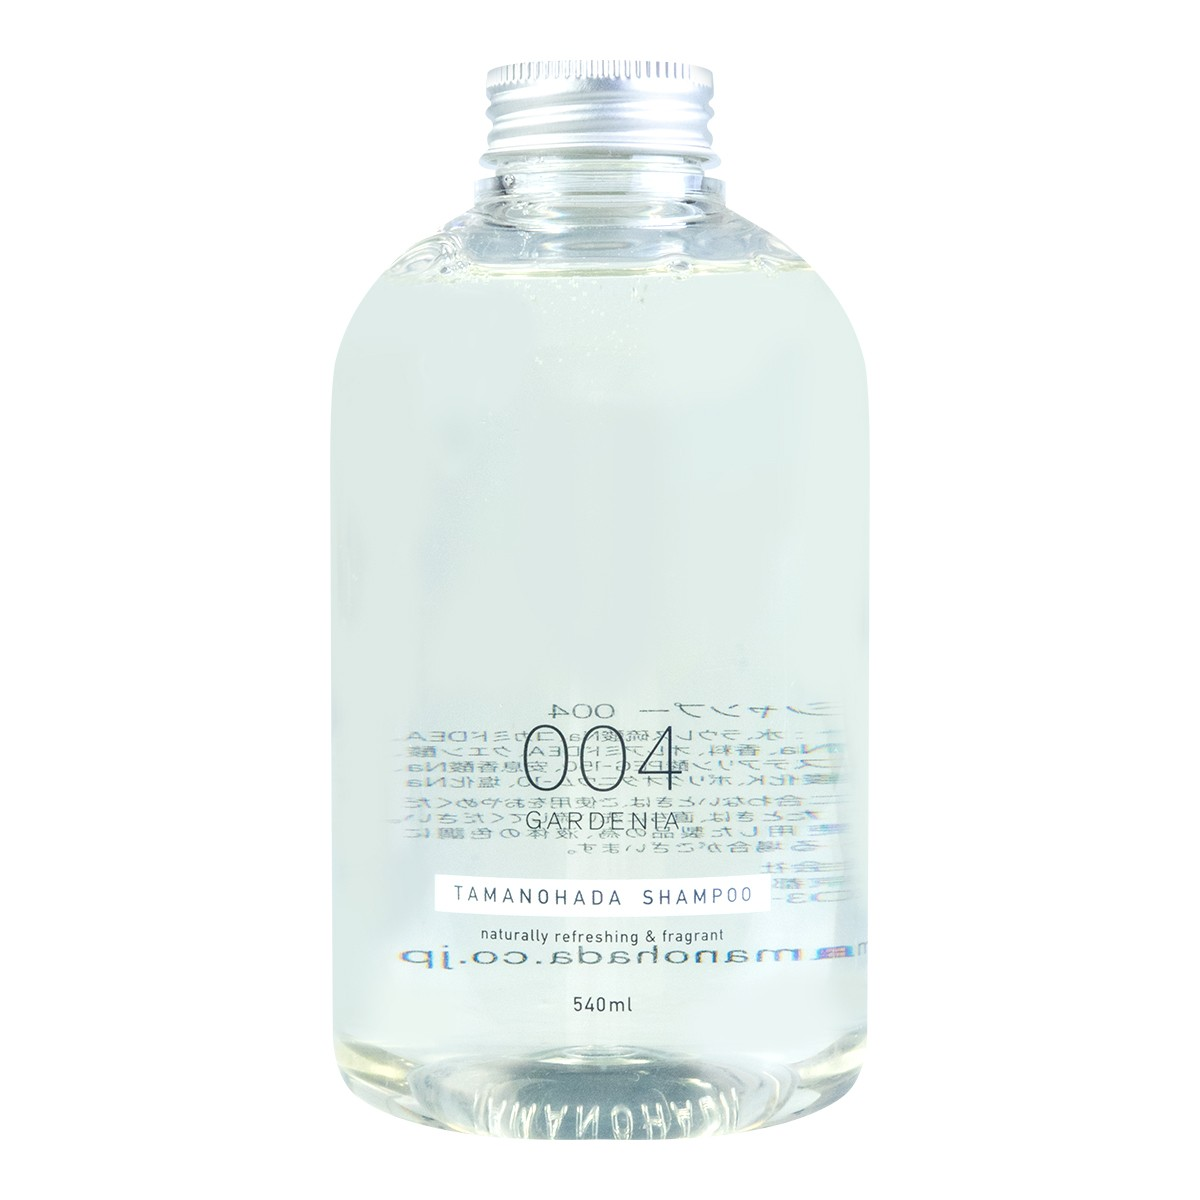 Yamibuy.com:Customer reviews:Shampoo Naturally Refreshing & Fragrant #004 Gardenia 540ml